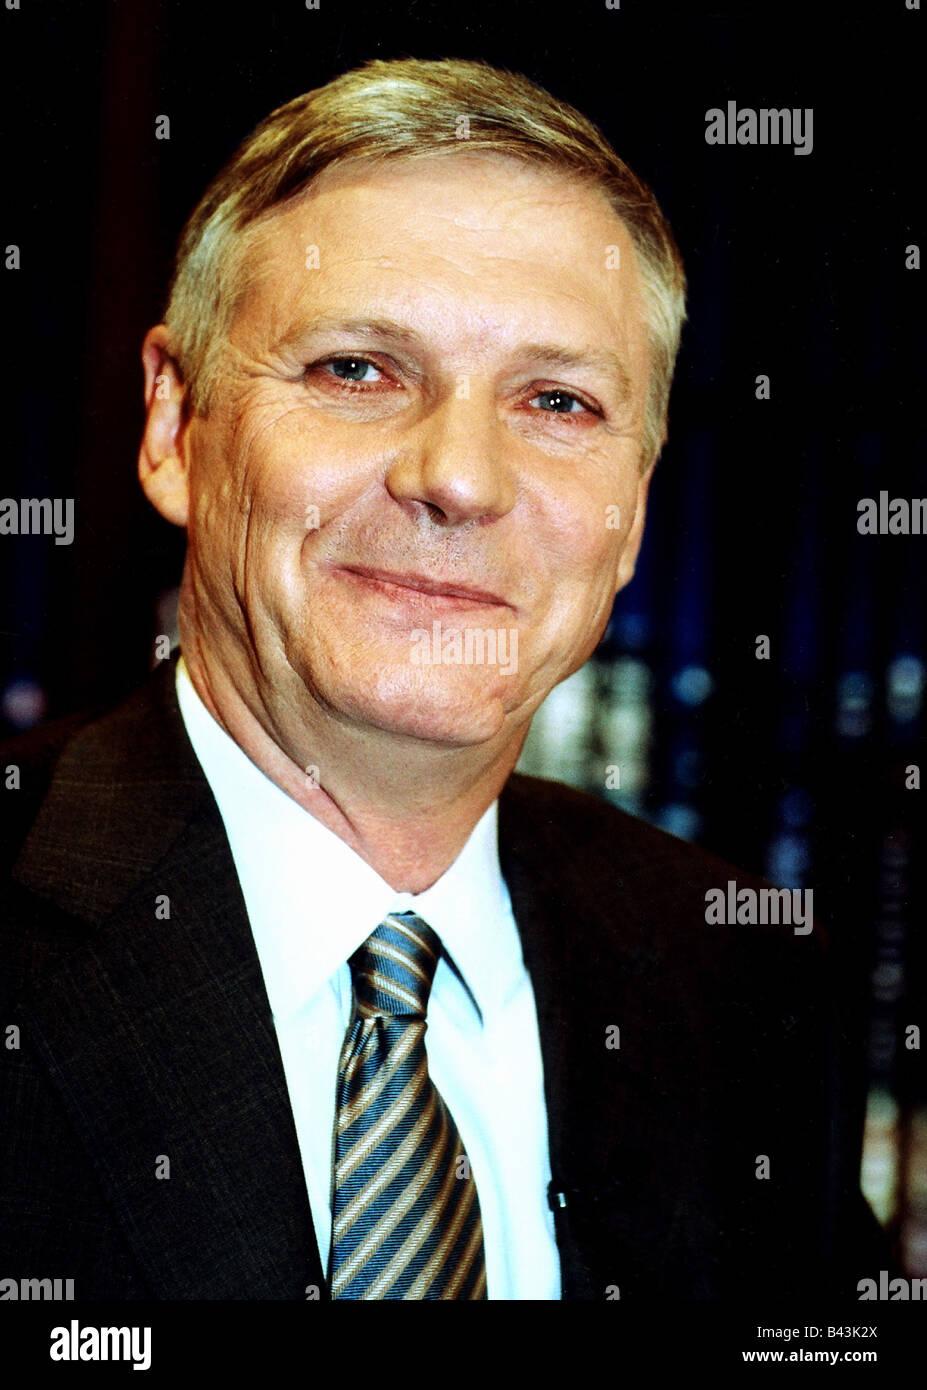 Schleyer, Hanns-Eberhard, German secretary general (ZHD), portrait, 2002 - schleyer-hanns-eberhard-german-secretary-general-zhd-portrait-2002-B43K2X